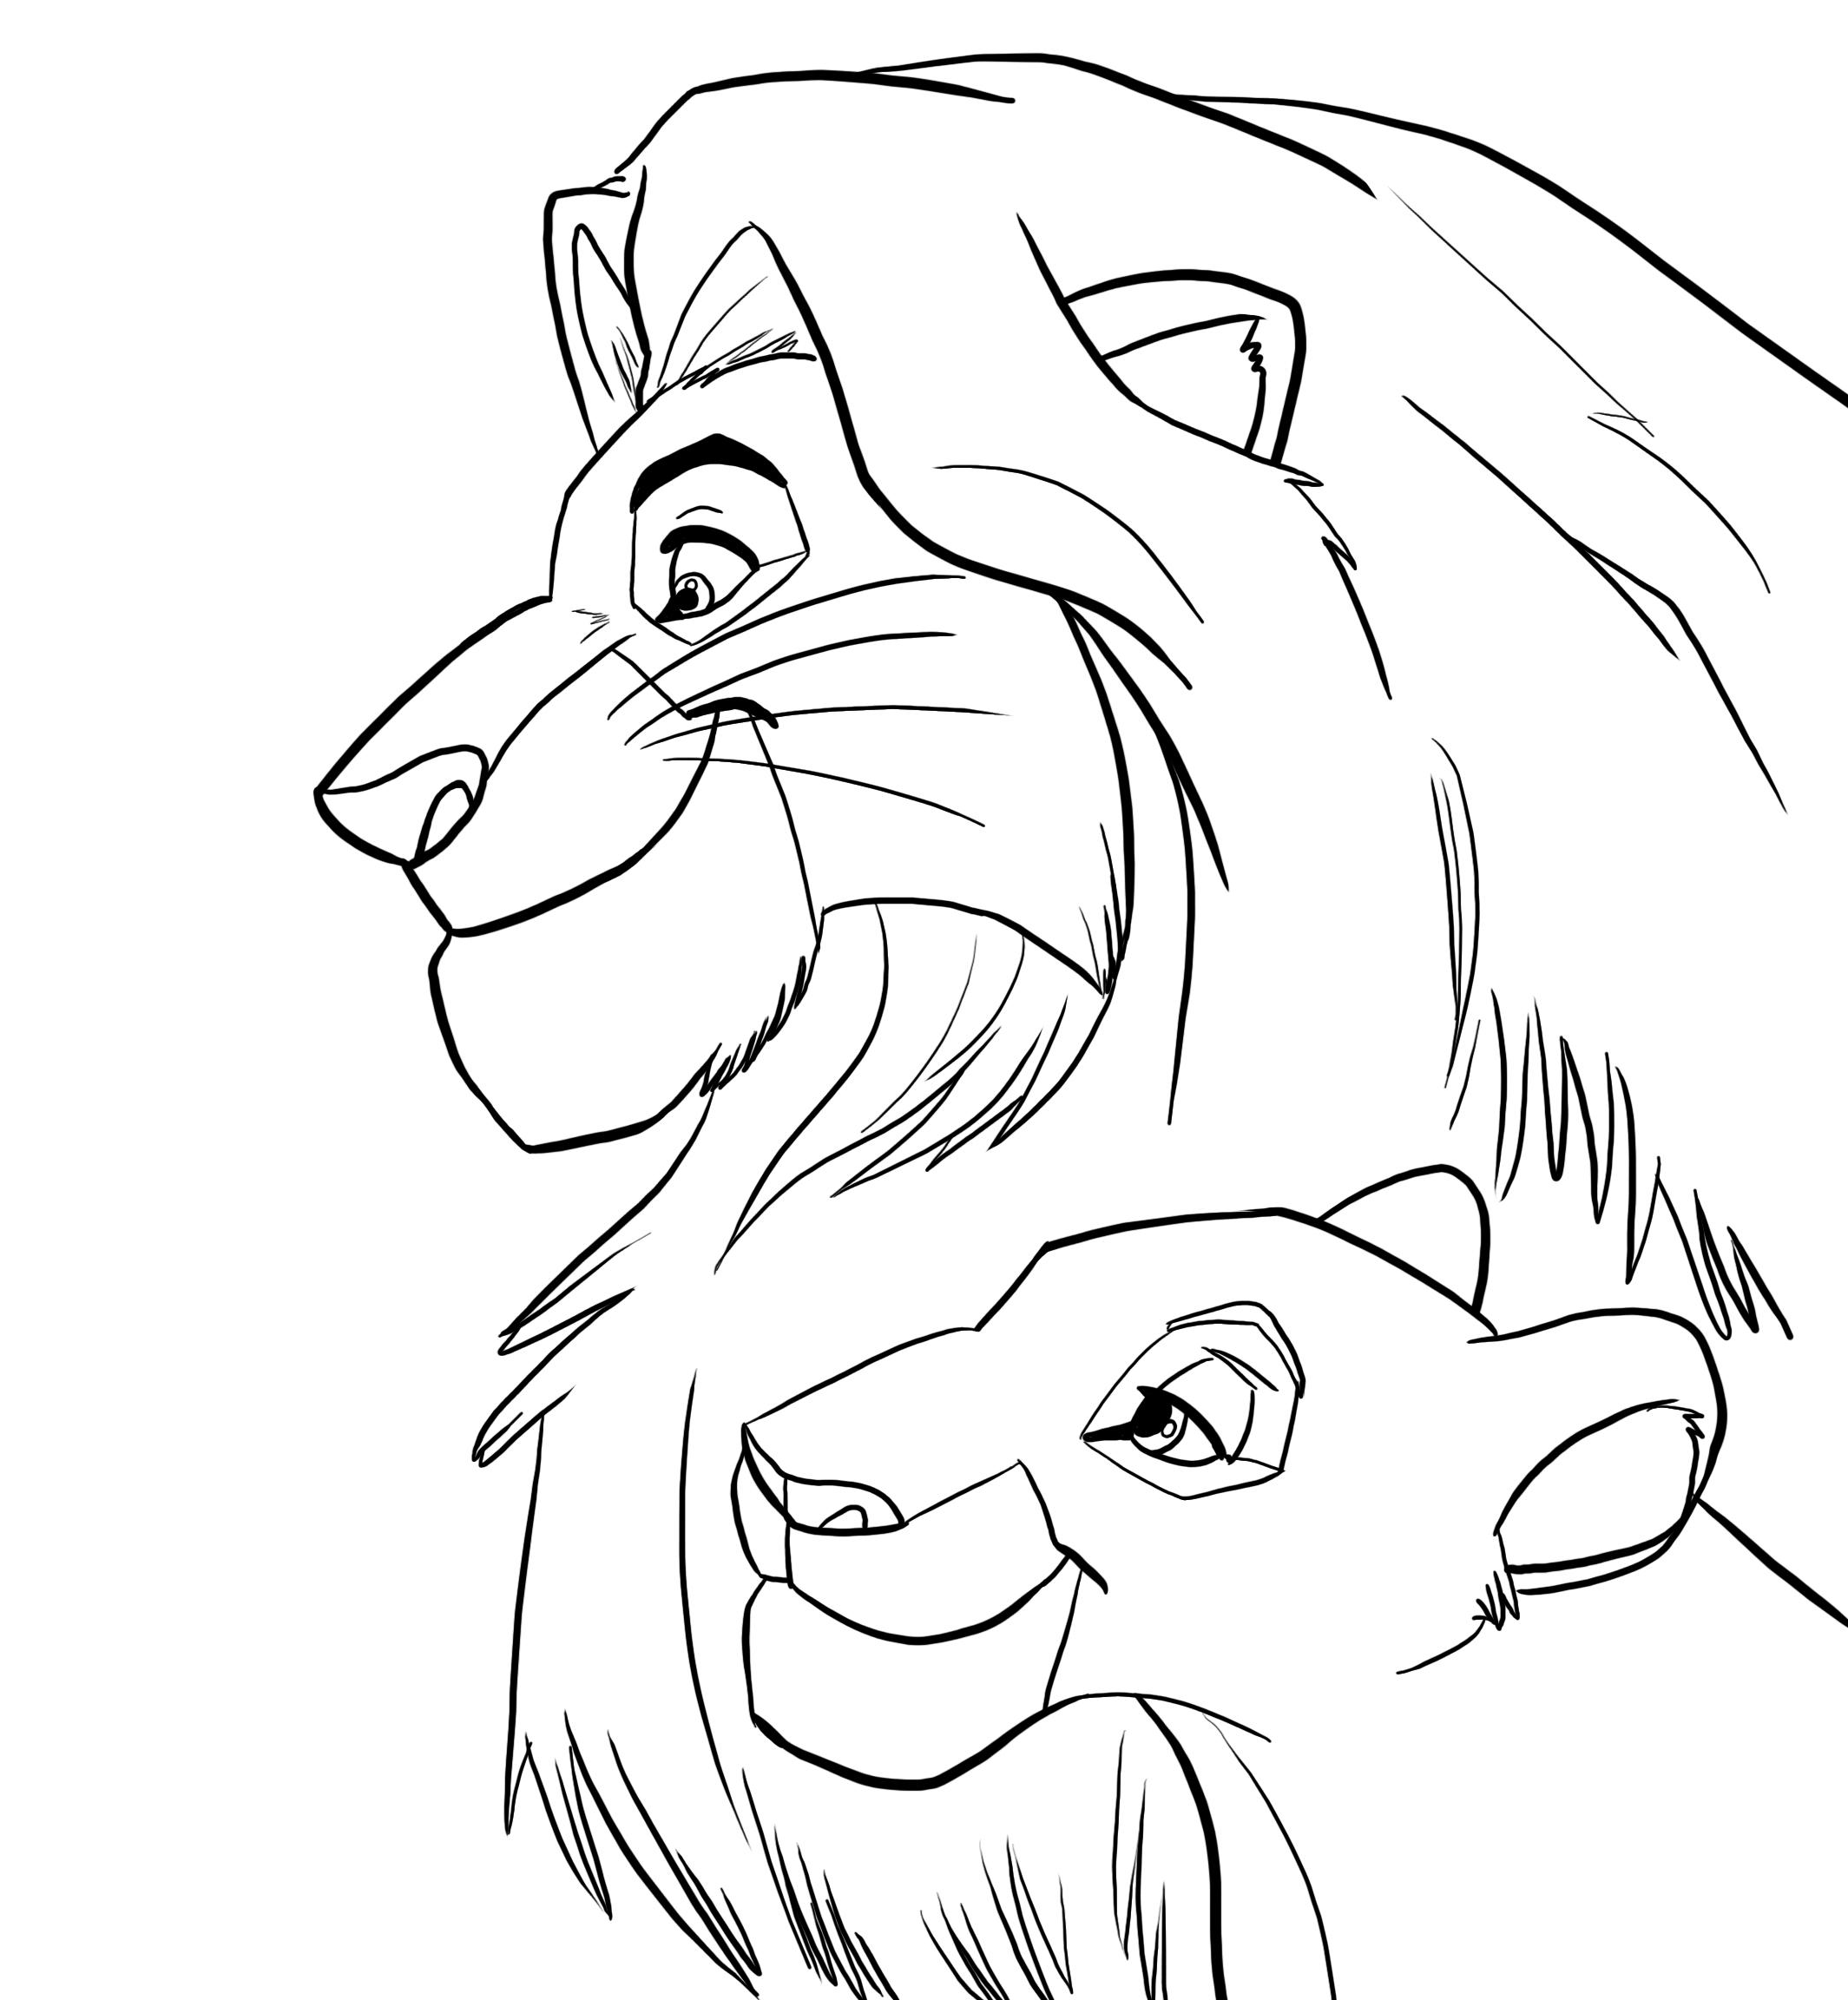 mufasa and sarabi_lineart by senshee mufasa and sarabi_lineart by senshee - Mufasa Coloring Pages